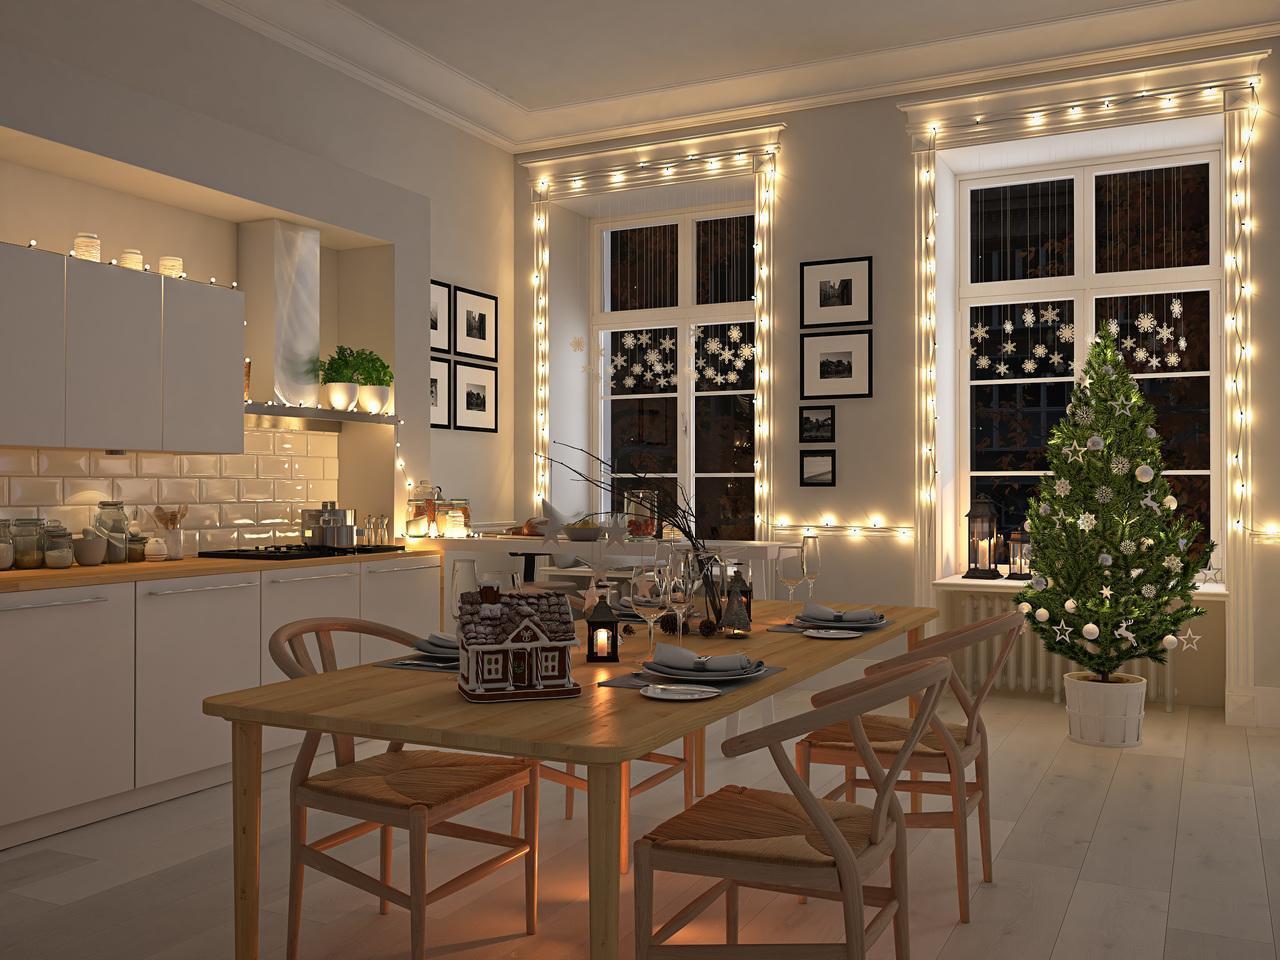 co na cian w kuchni dodatki kt re wygl daj idealnie. Black Bedroom Furniture Sets. Home Design Ideas